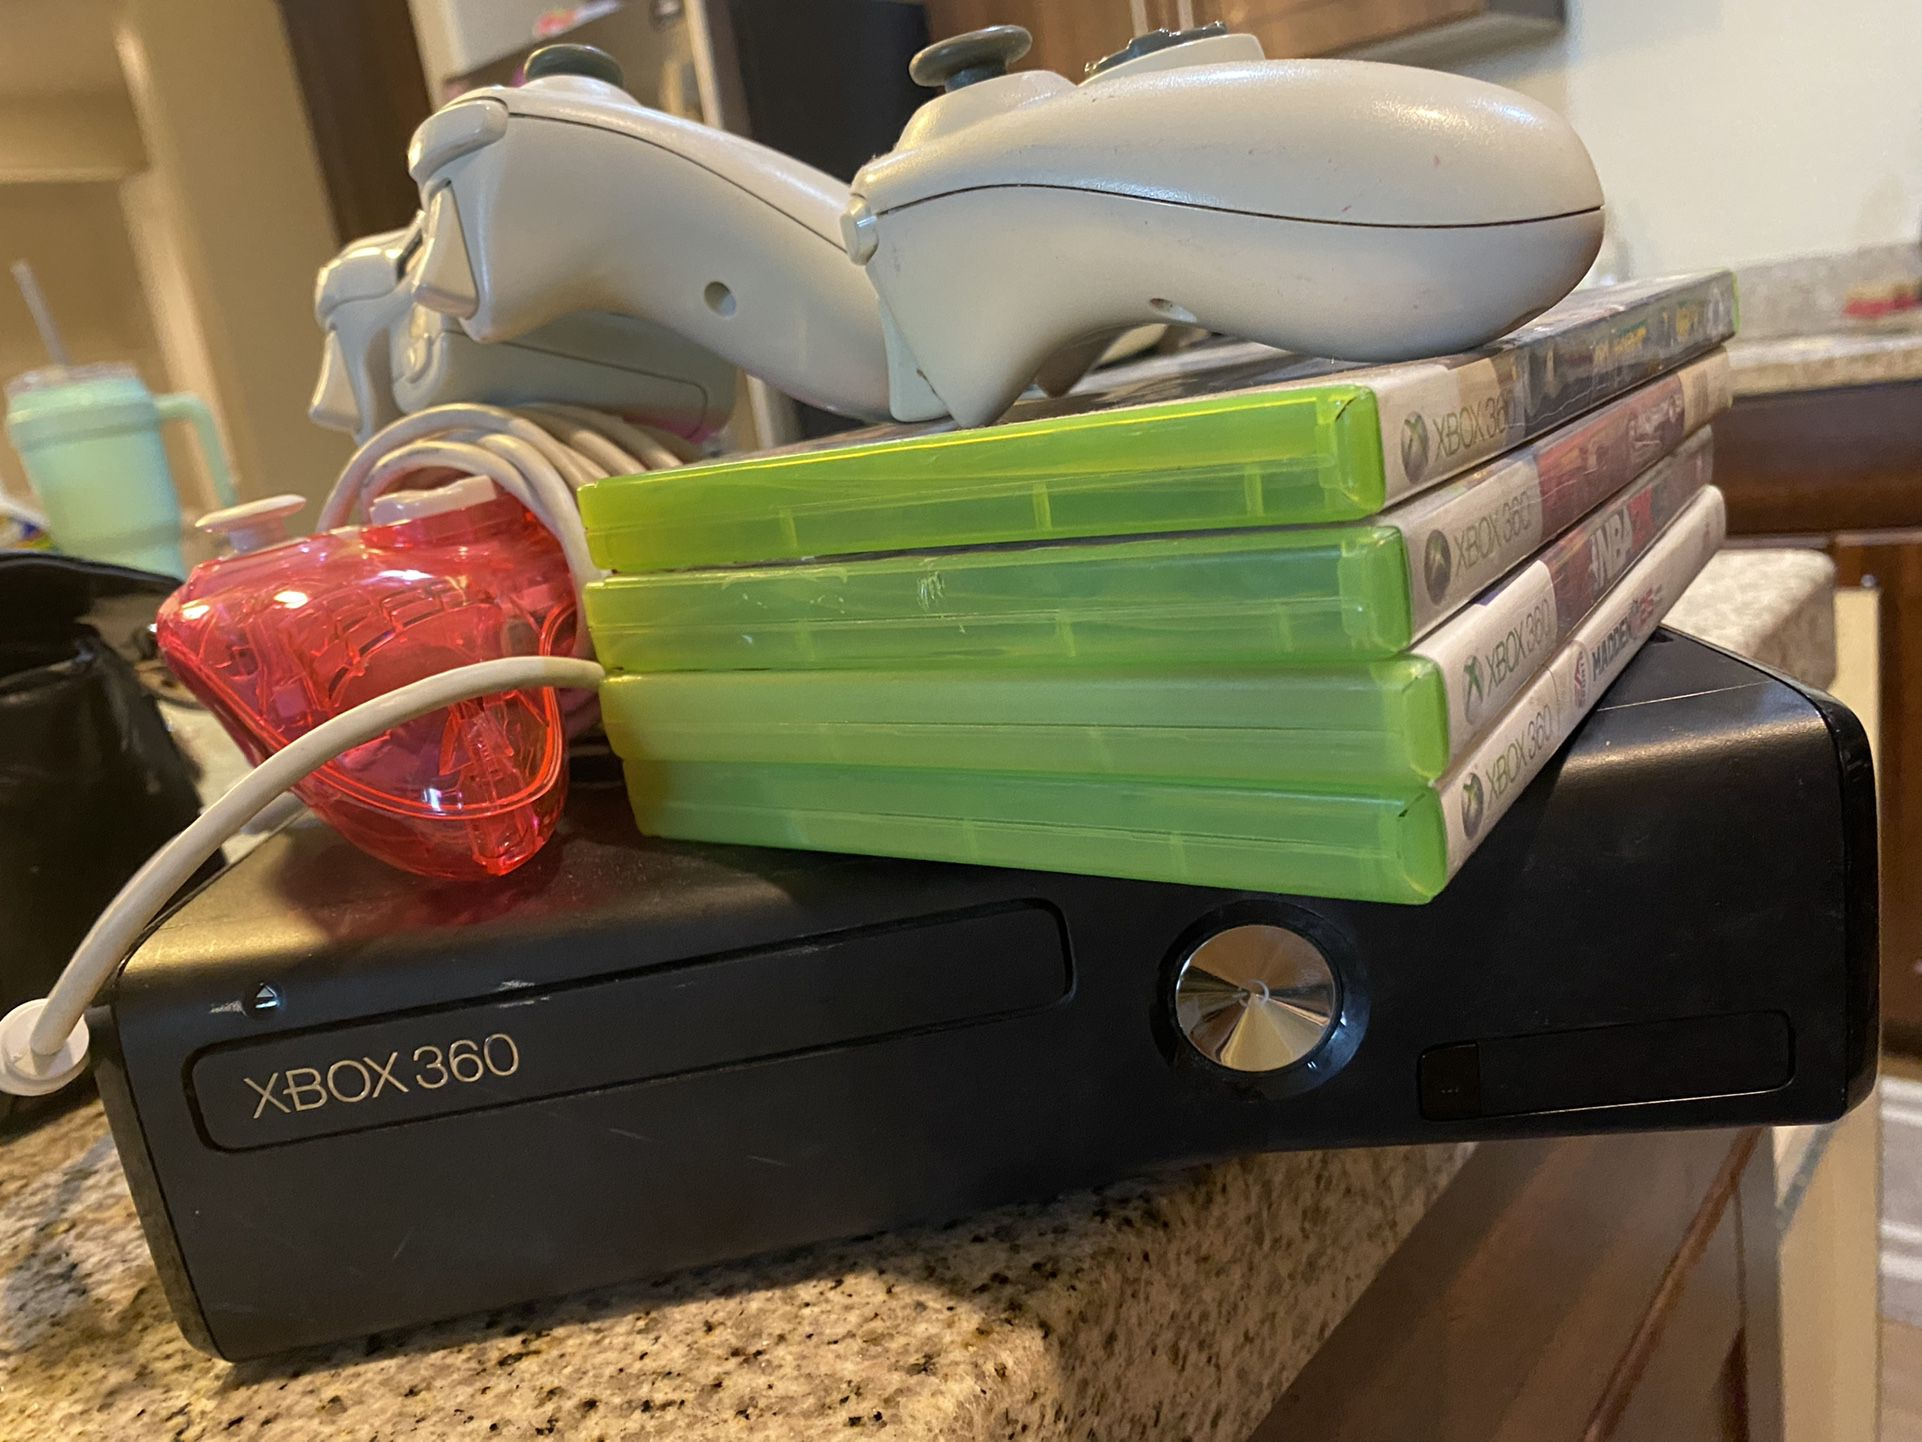 Xbox 360, 5 remotes, 4 Games